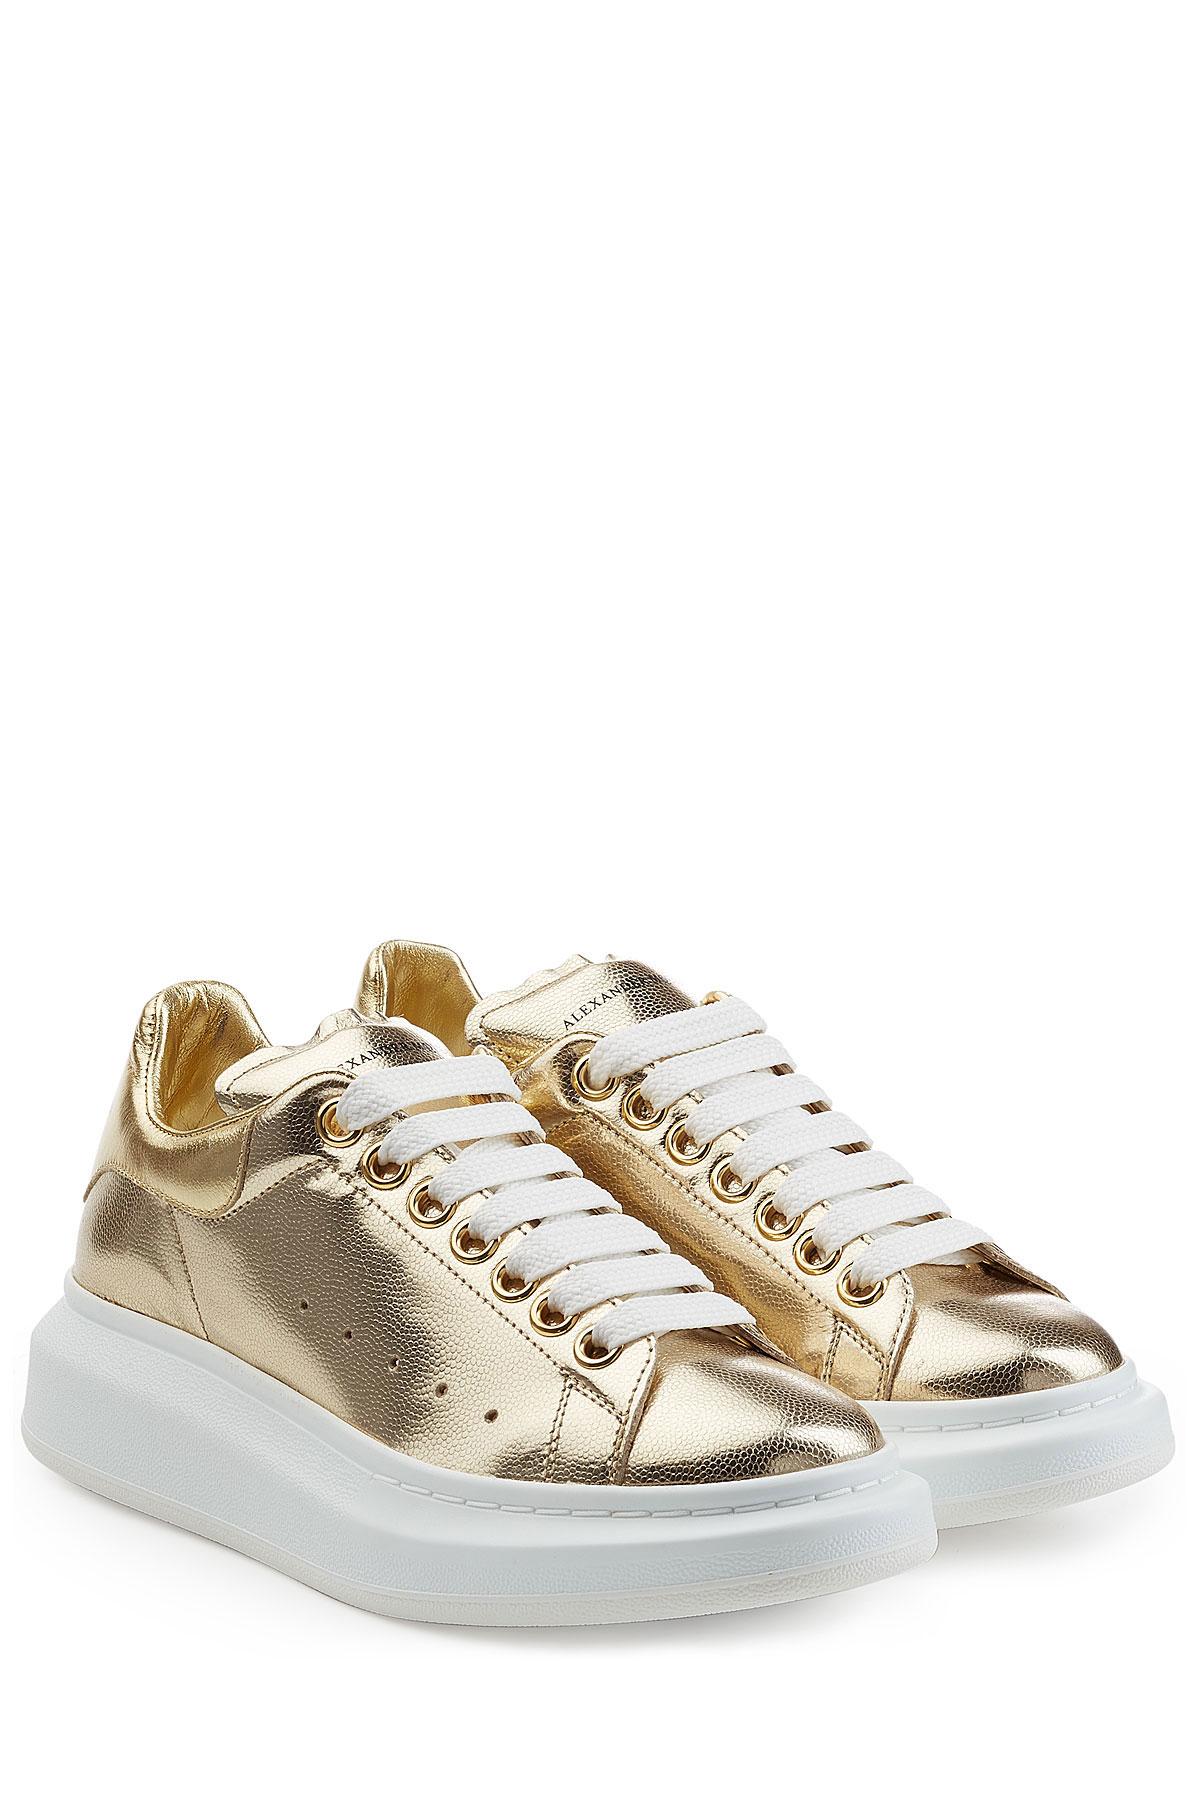 e7fc25d82 Alexander McQueen Metallic Leather Sneakers - Gold in Metallic - Lyst